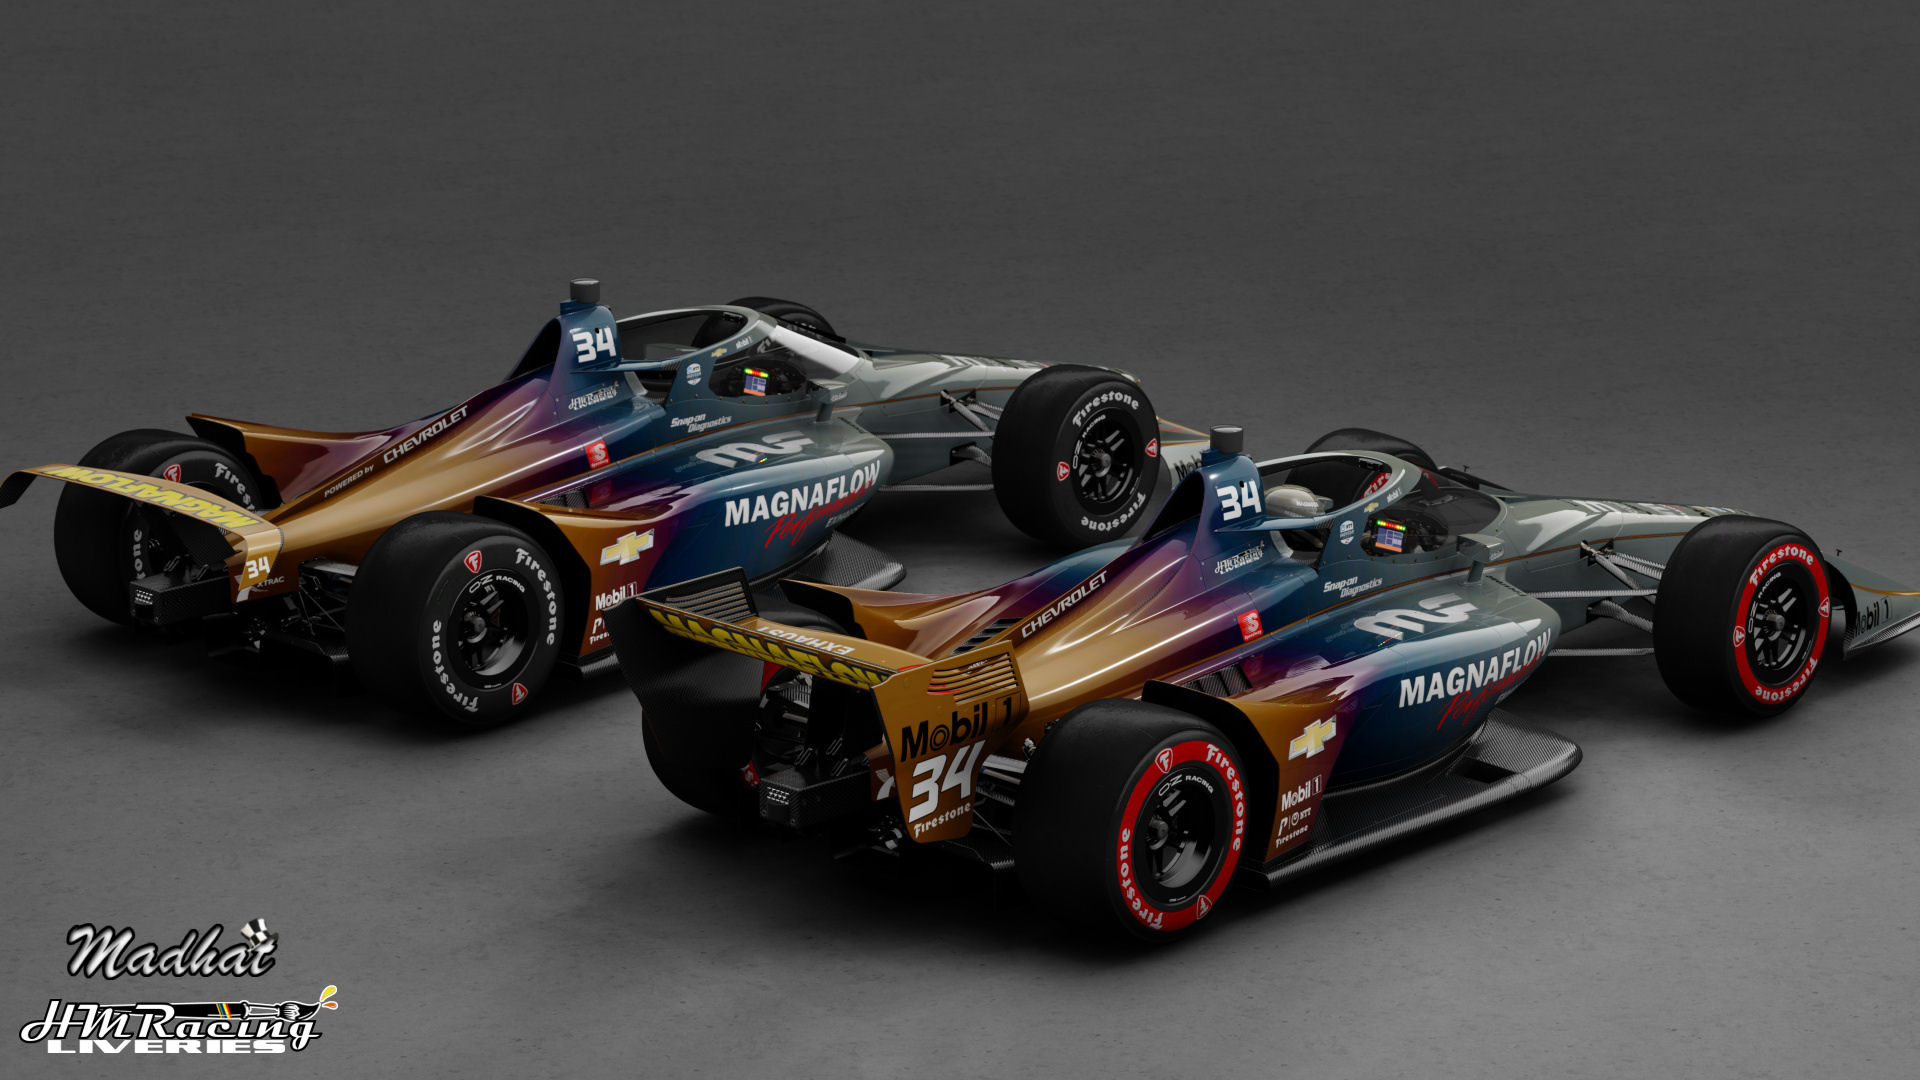 MAGNAFLOW 34 IndyCar Madhat HMRacing Liveries 04.jpg